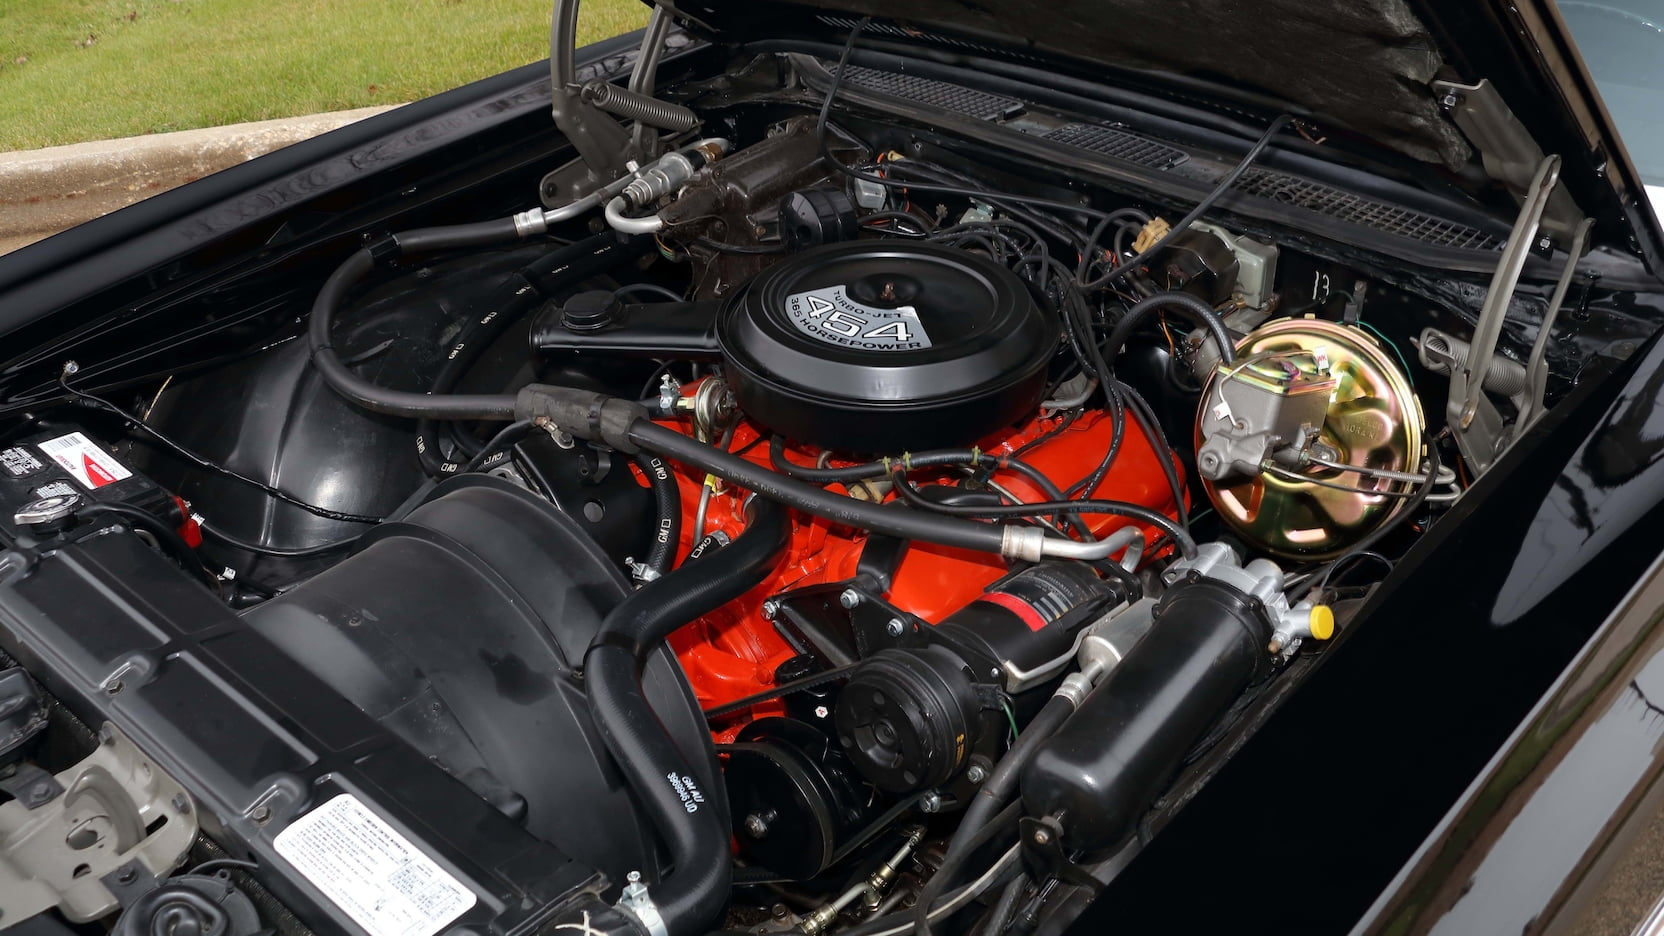 1971 Chevrolet Monte Carlo SS engine